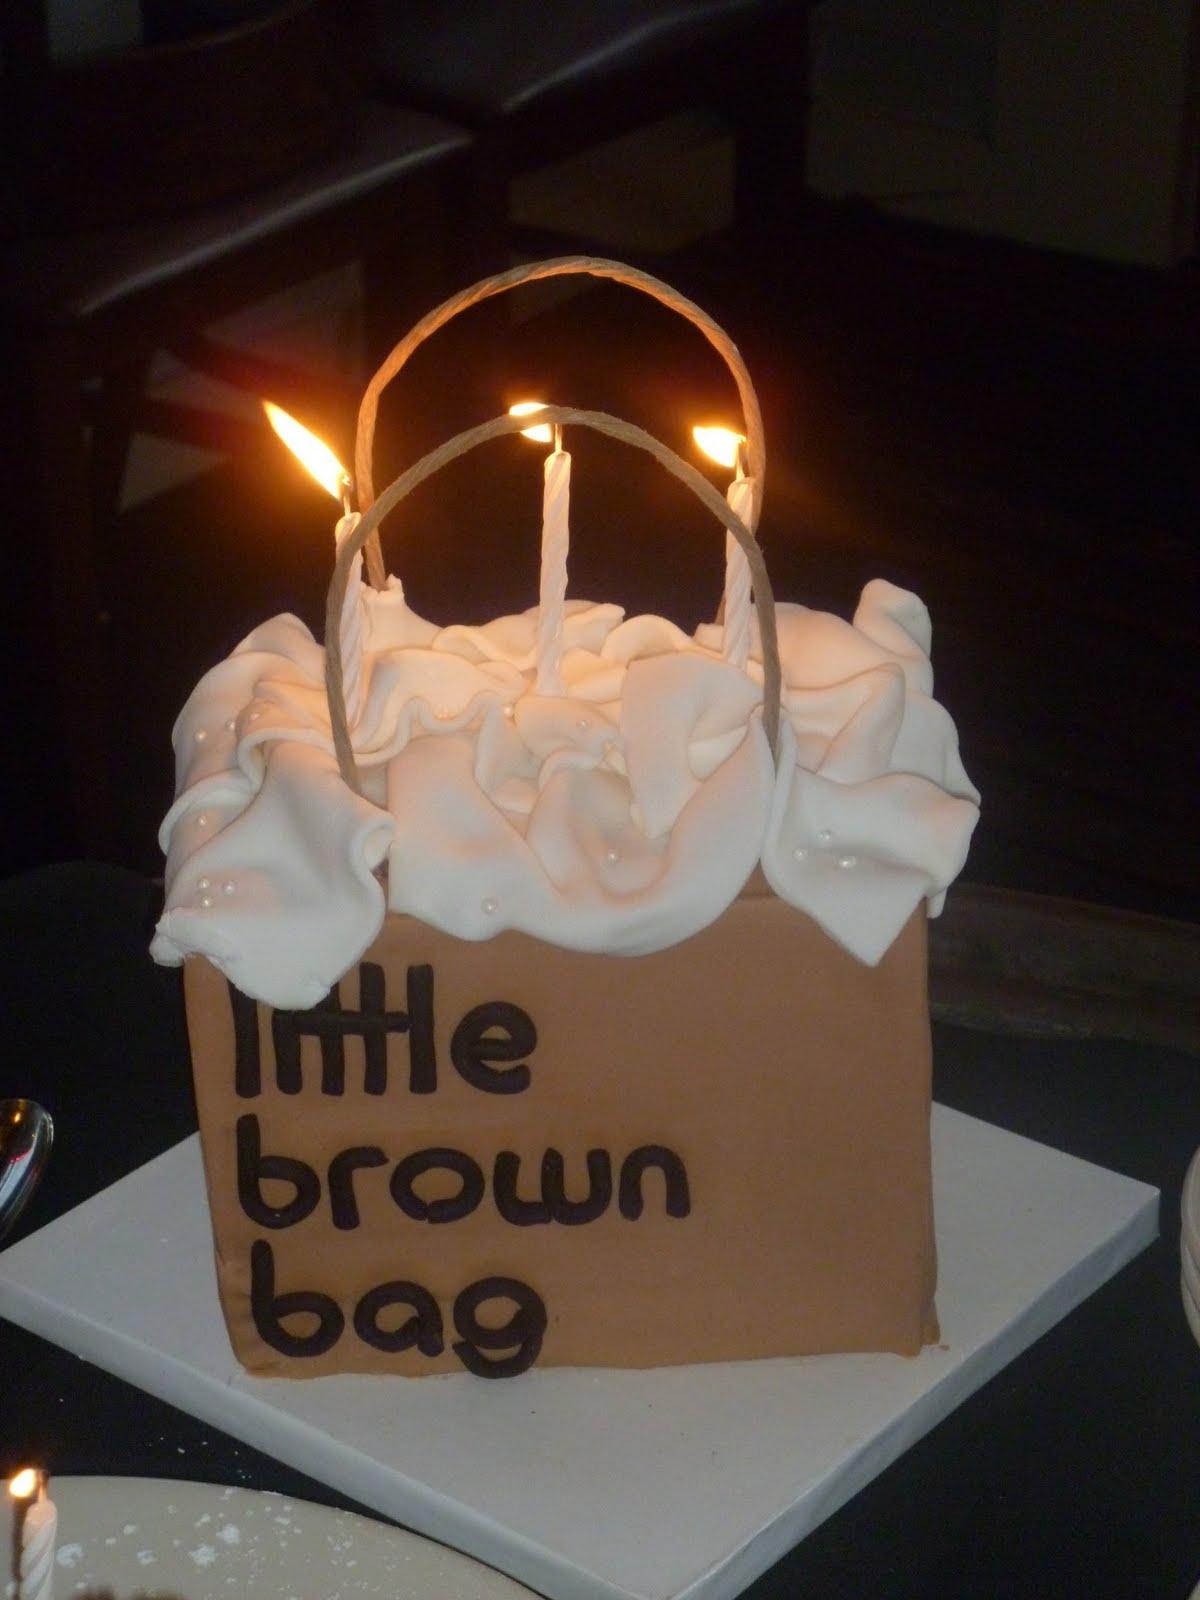 Your Happy Baker Little Brown Bag Birthday Cake